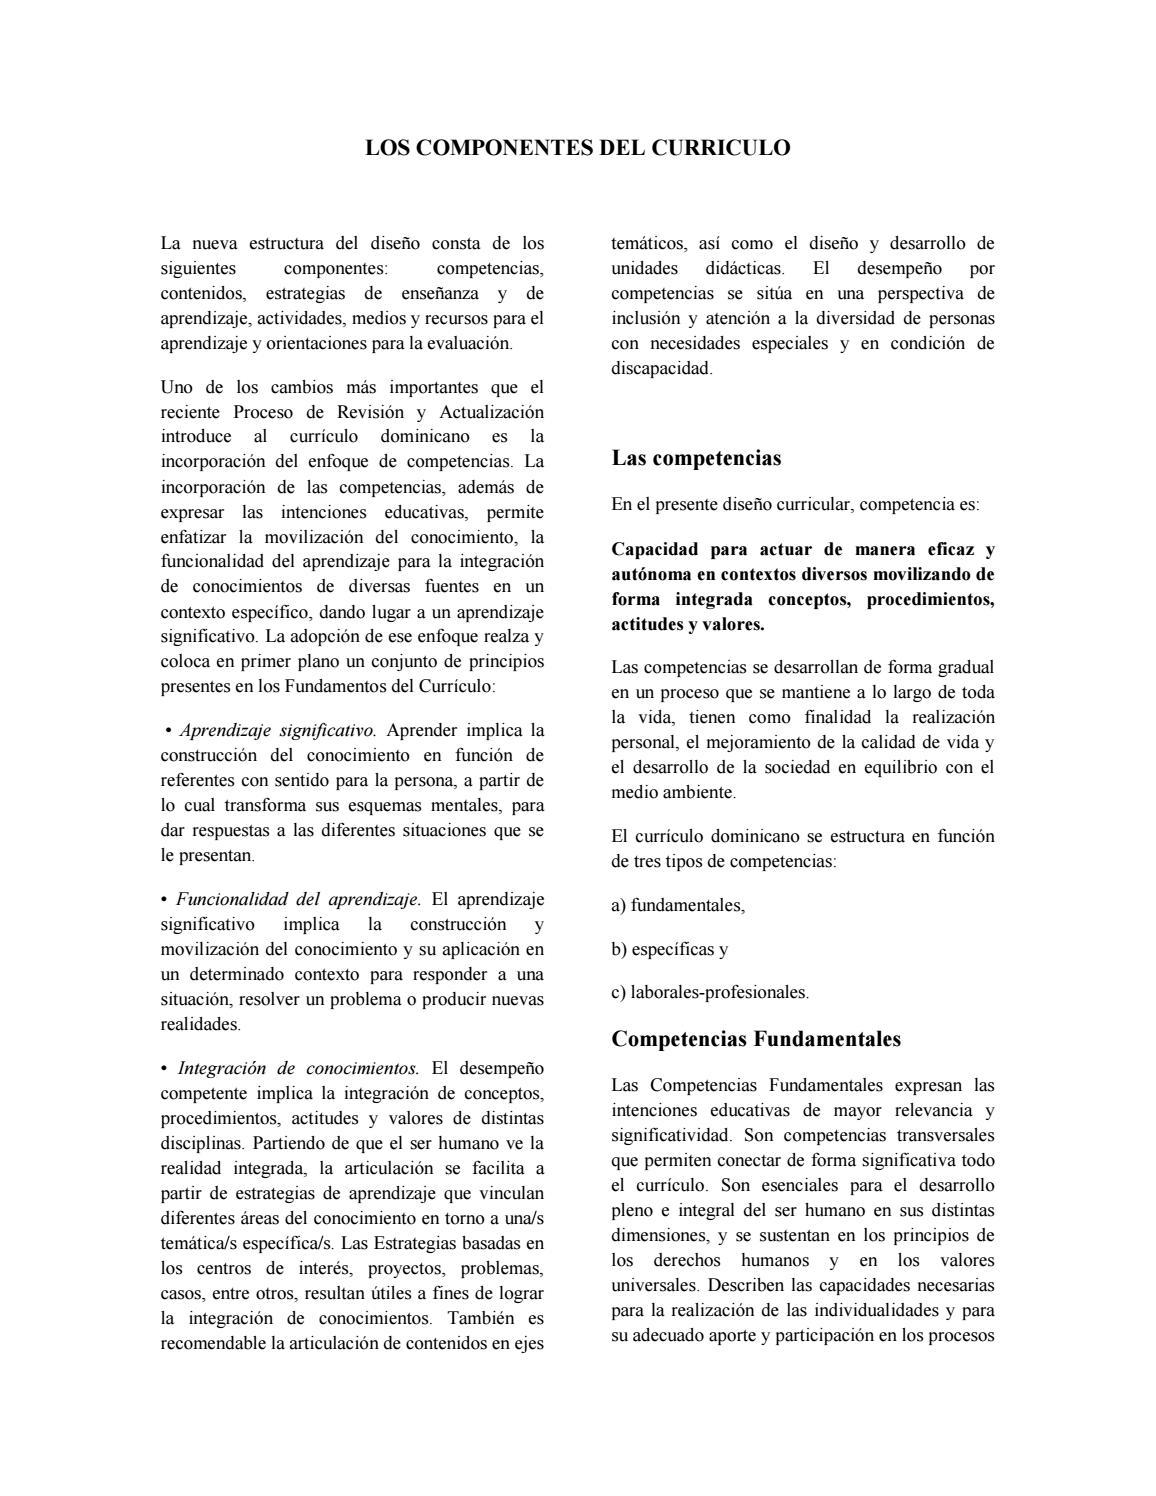 Componentes del curriculo by Mirla Frómeta - issuu